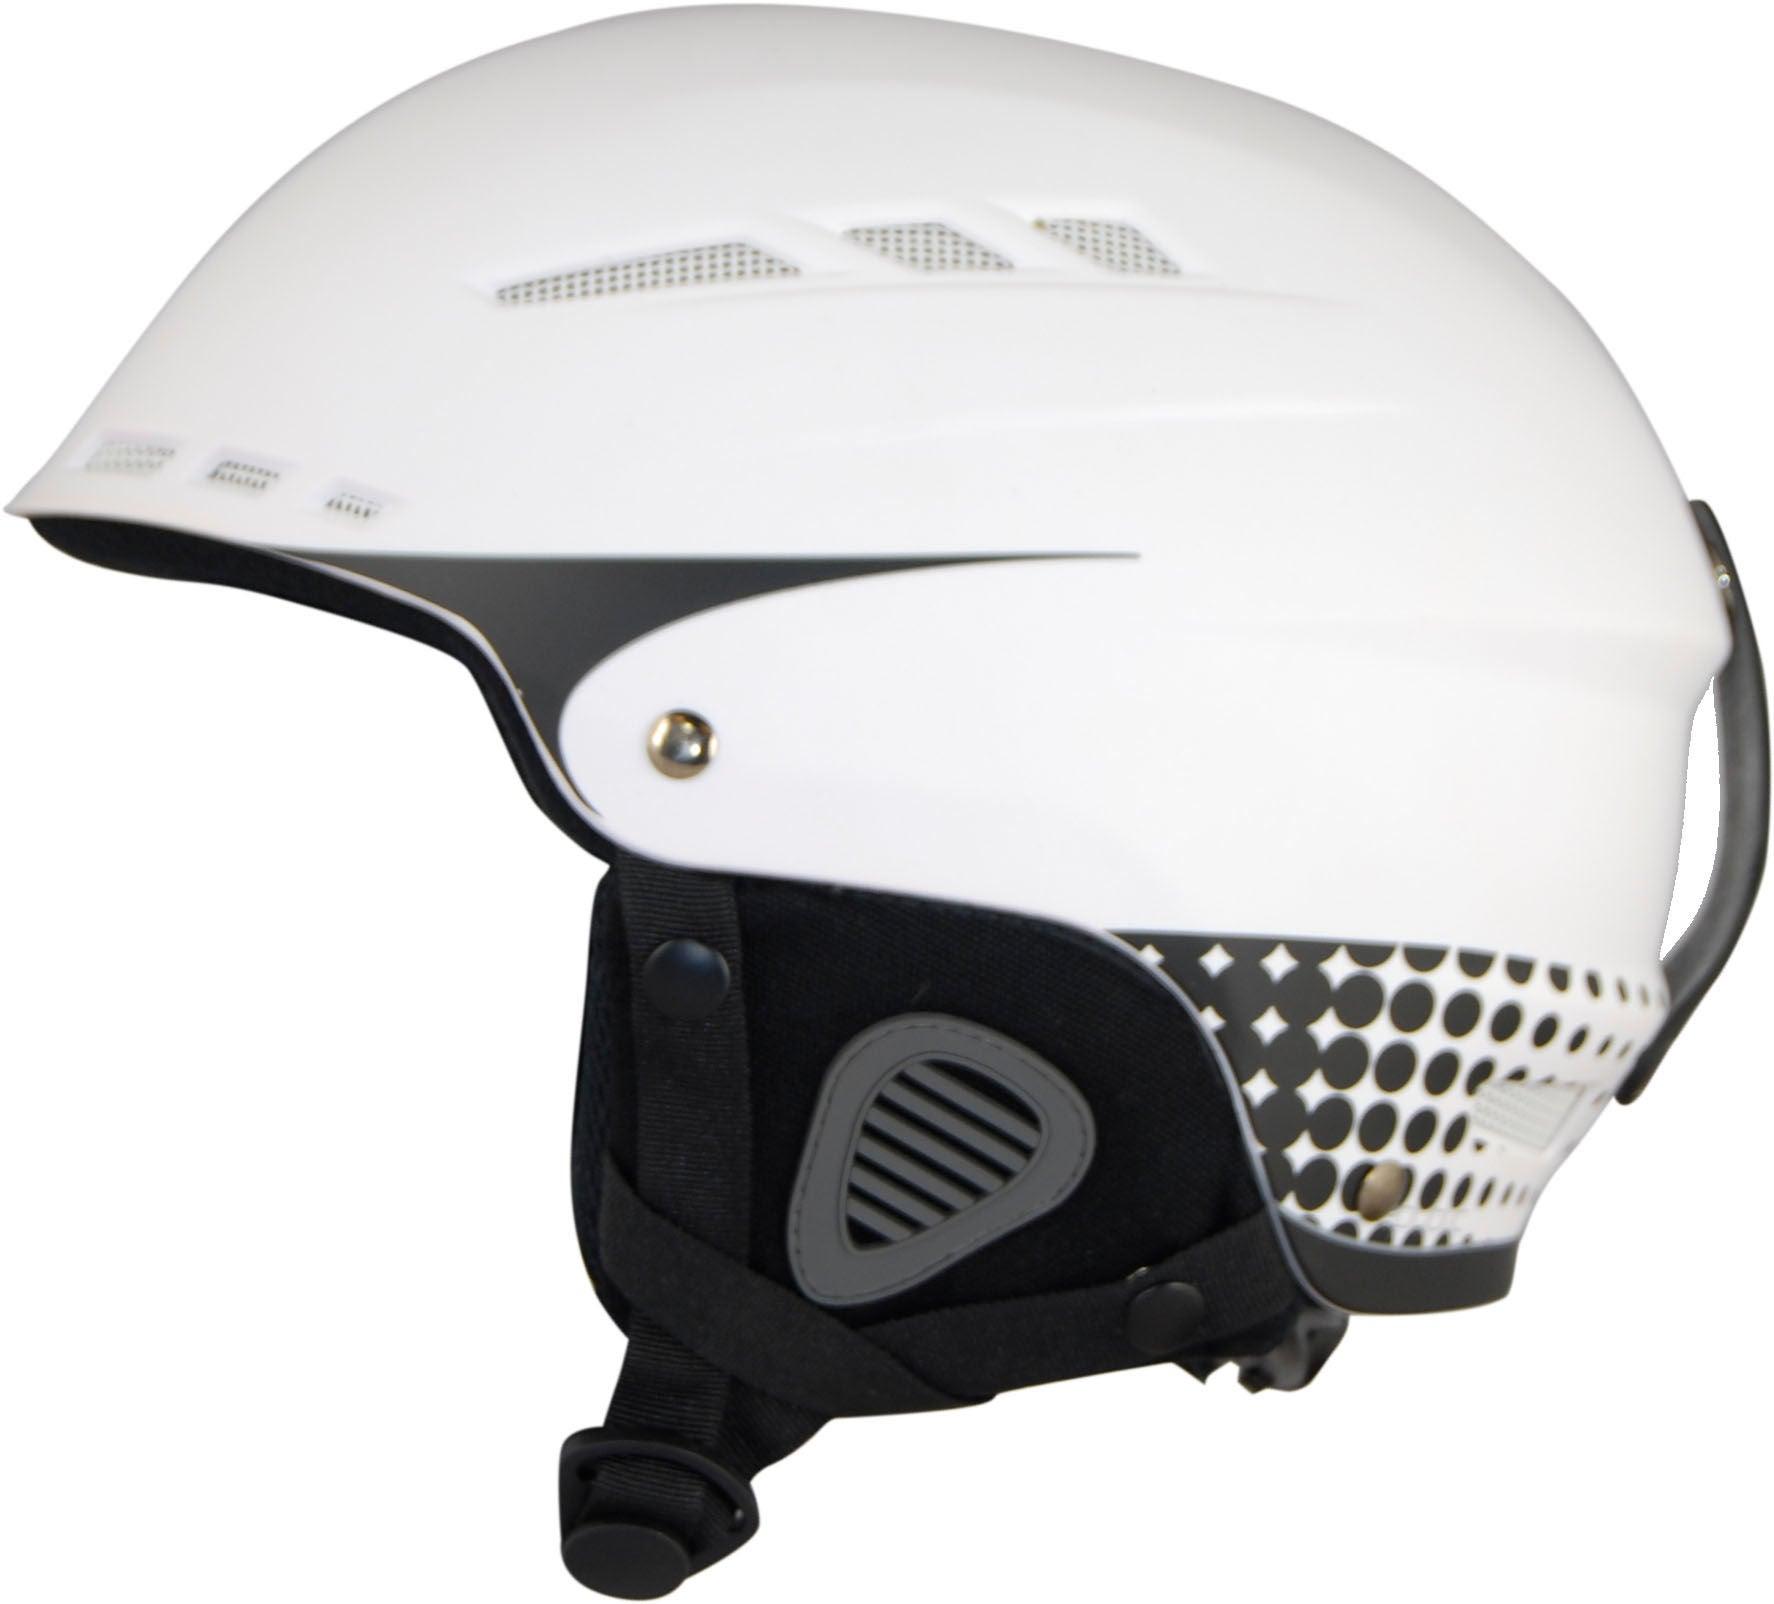 Republic R250 Skidhjälm JR, White 48-50